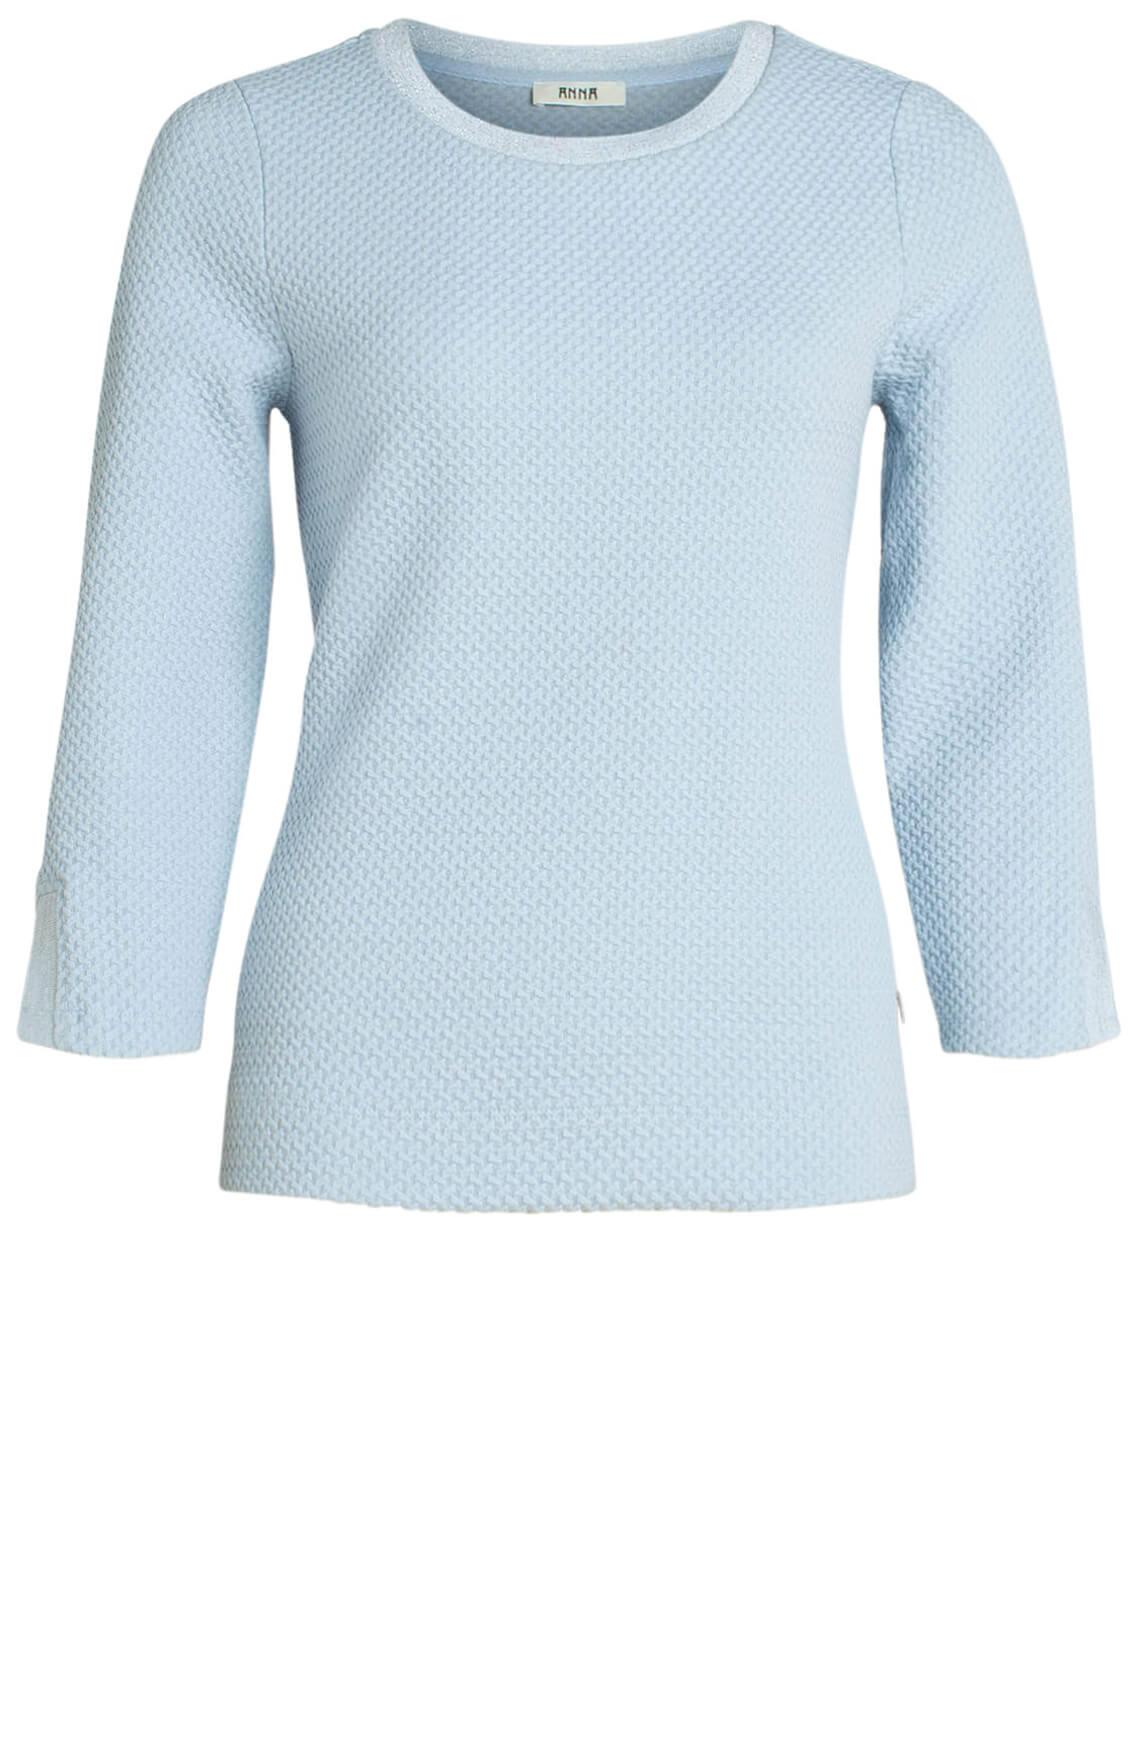 Anna Dames Sweater met reliëf Blauw